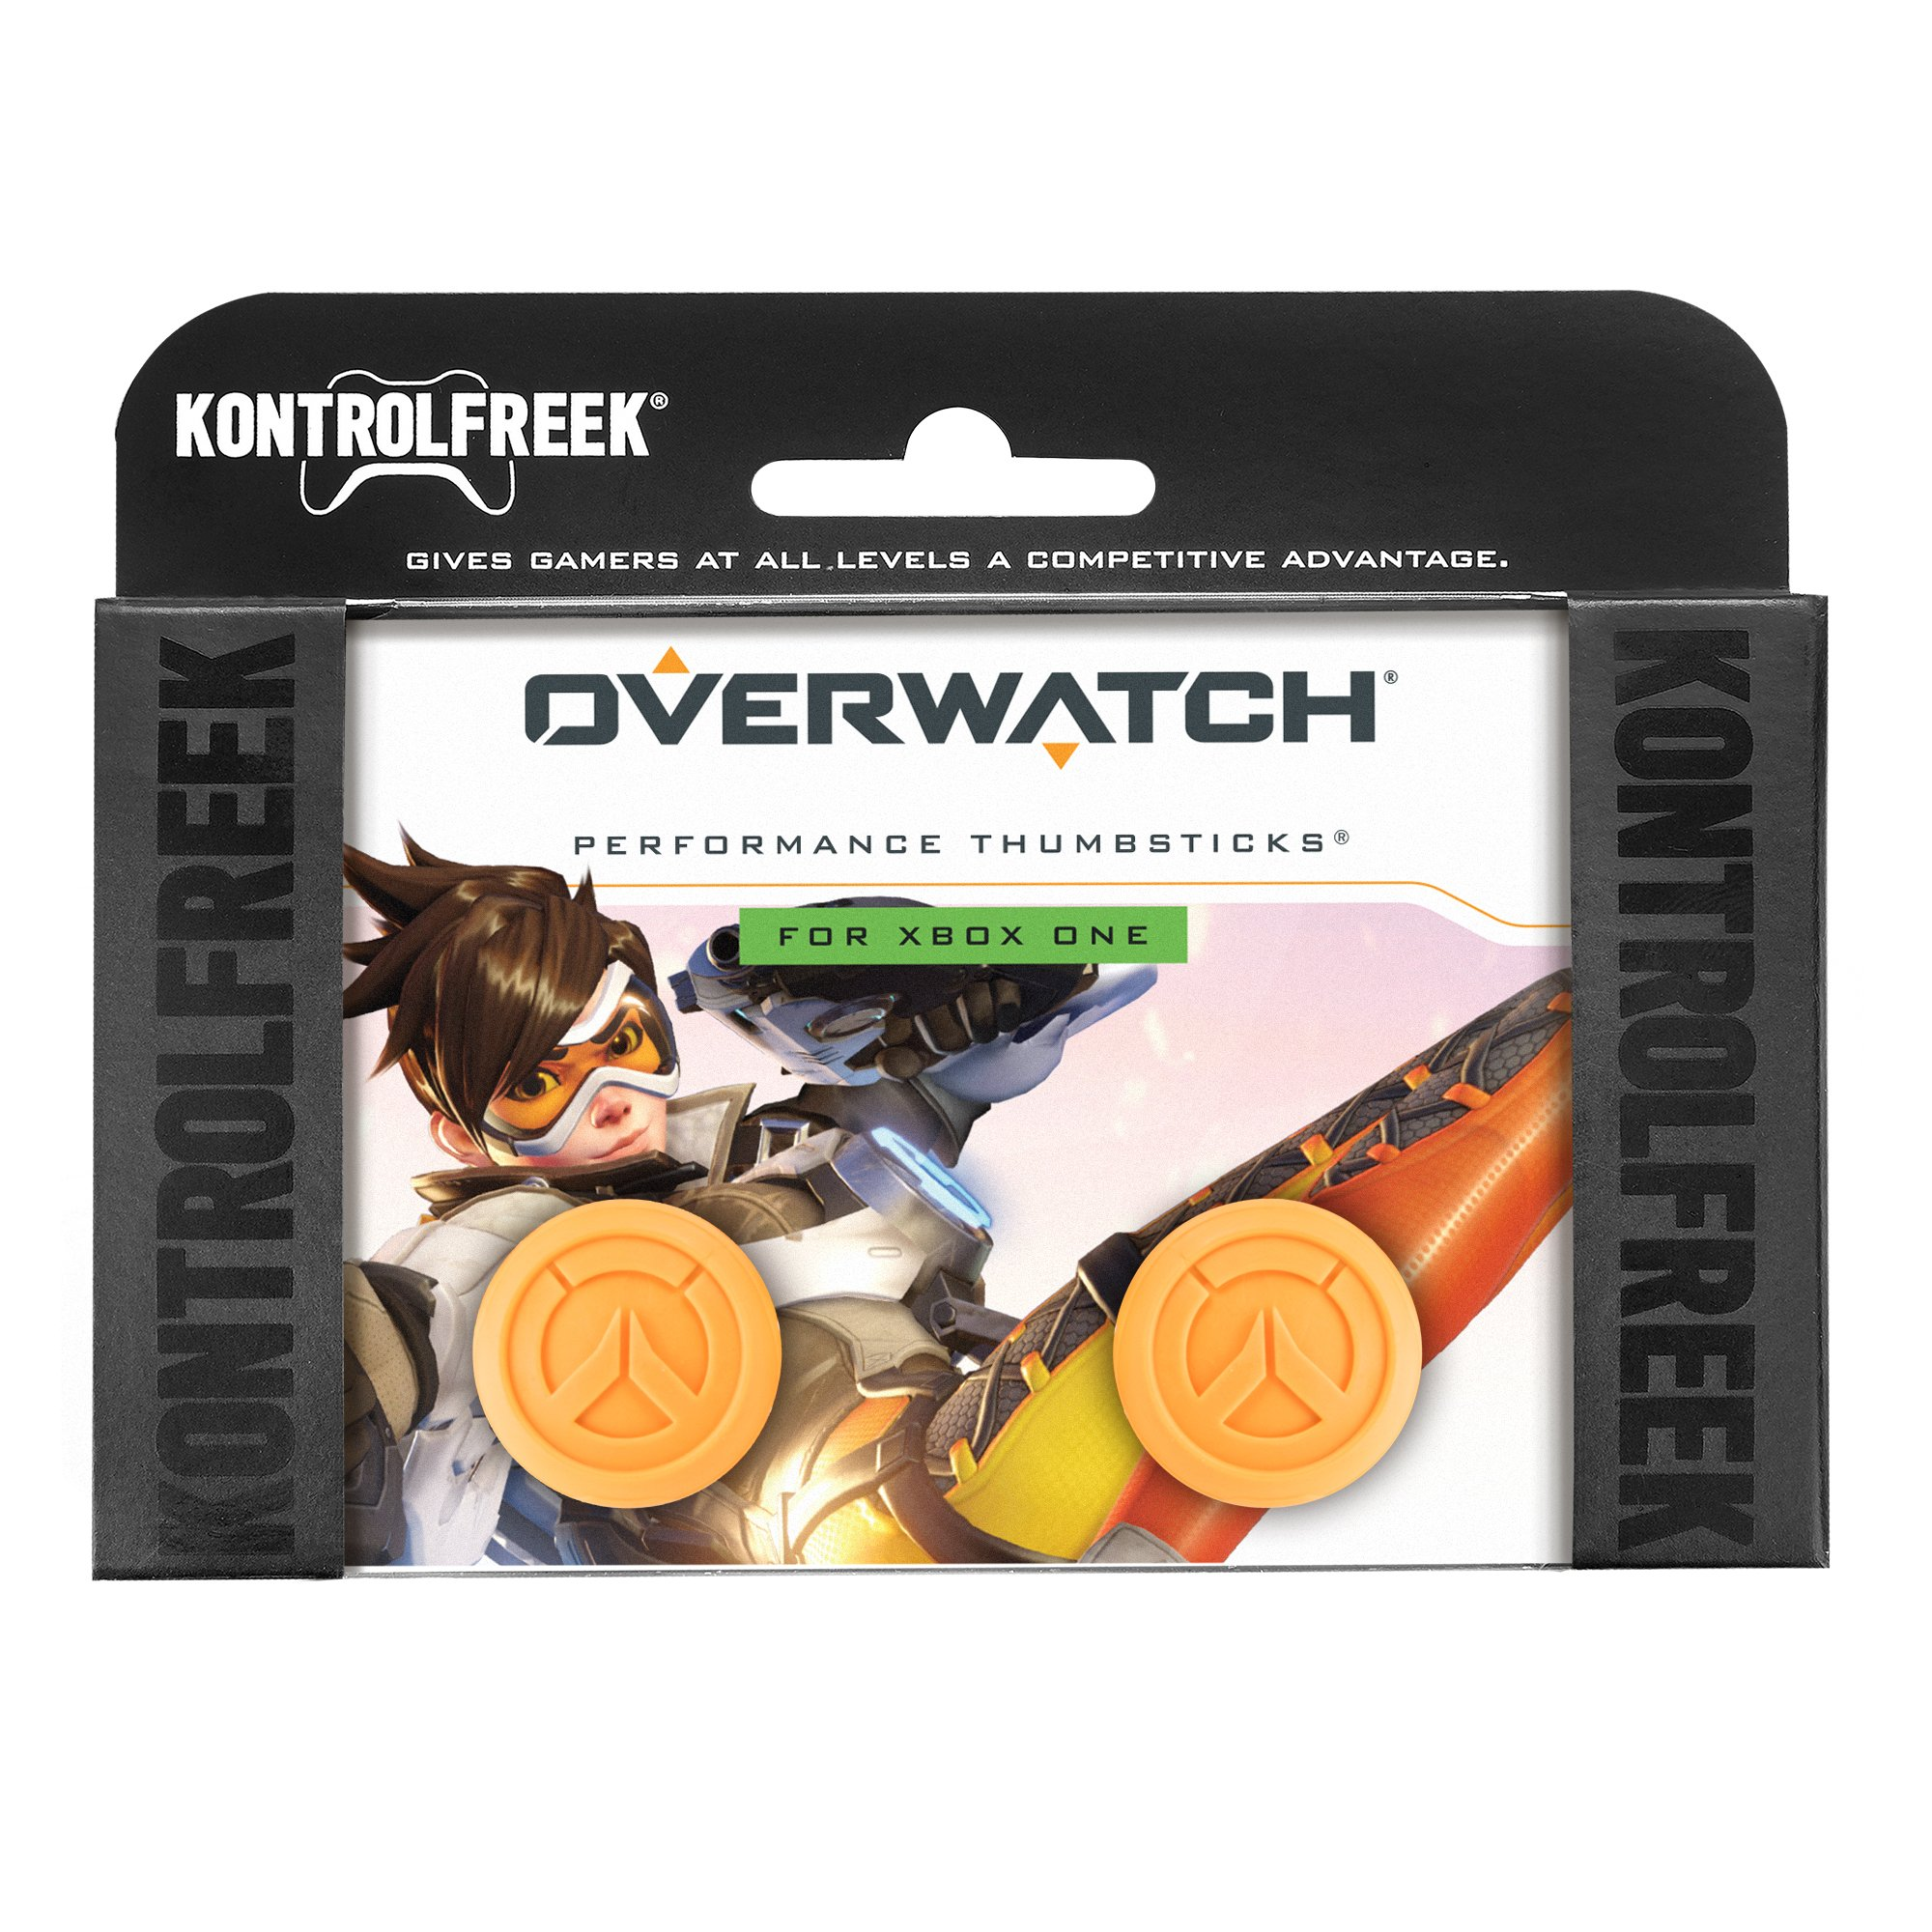 KontrolFreek Overwatch Performance Thumbsticks for Xbox One Controller by KontrolFreek